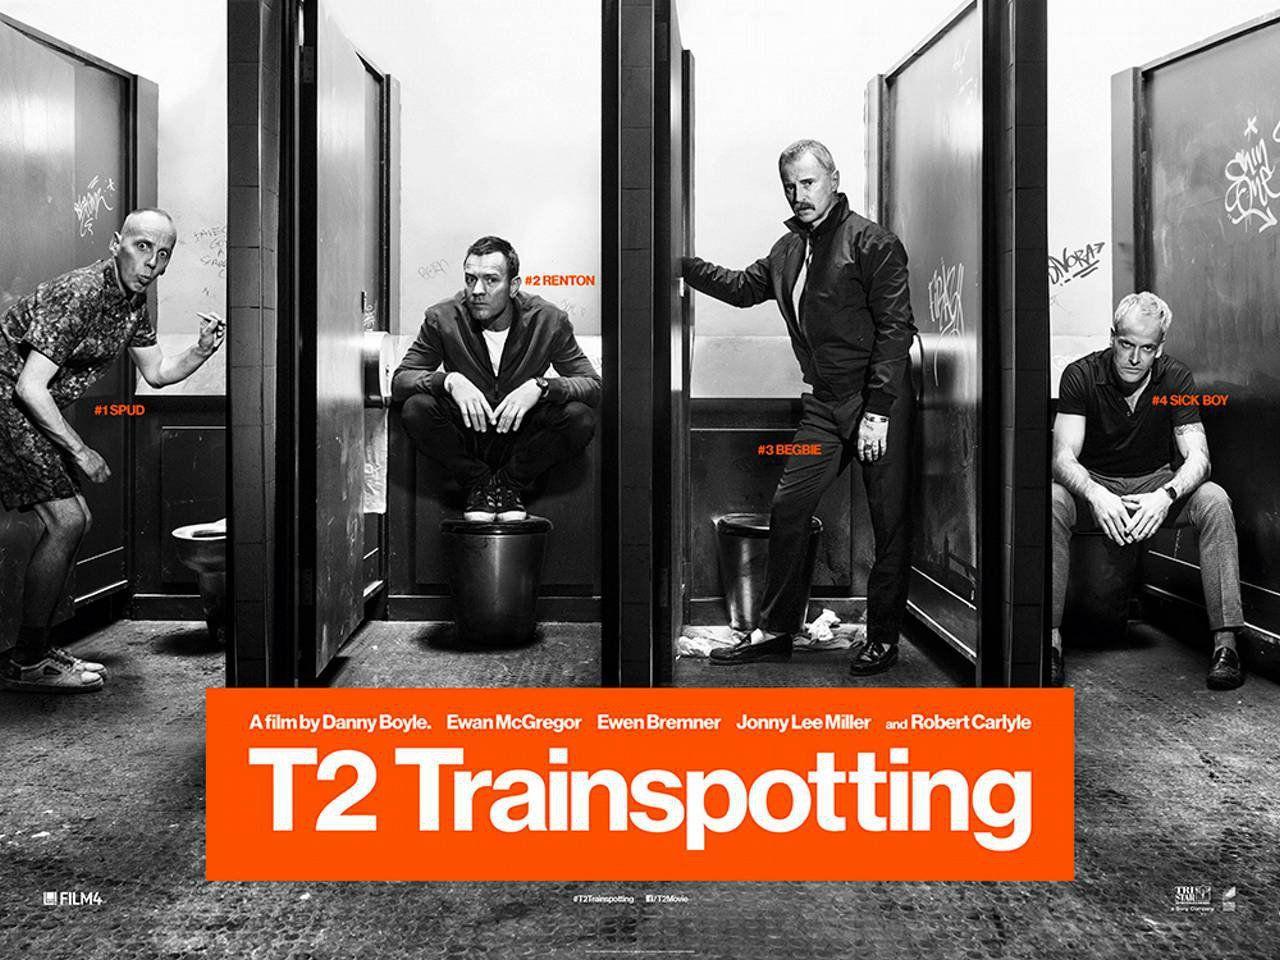 t2 trainspotting 2019